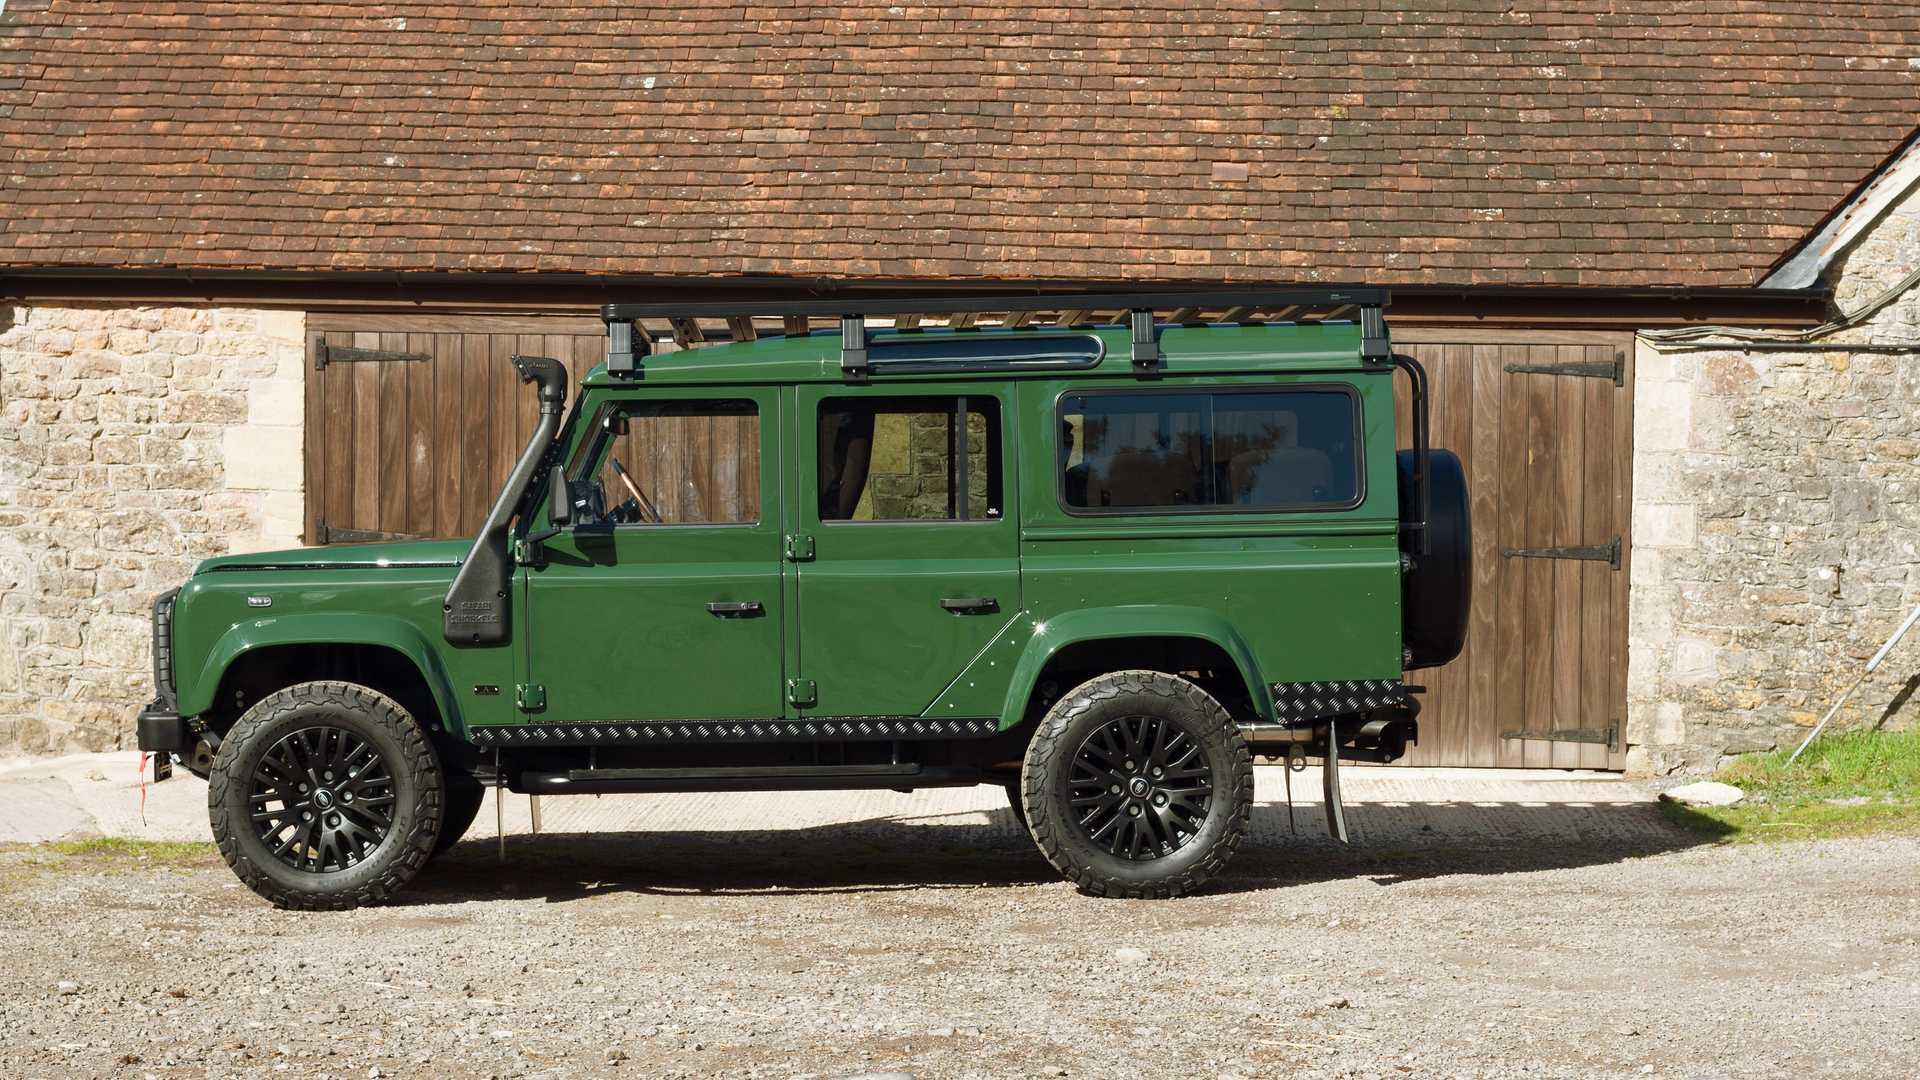 arkonik-defenders-drogo-d110-1 Drogo: Land Rover-ul Defender inspirat din Game Of Thrones